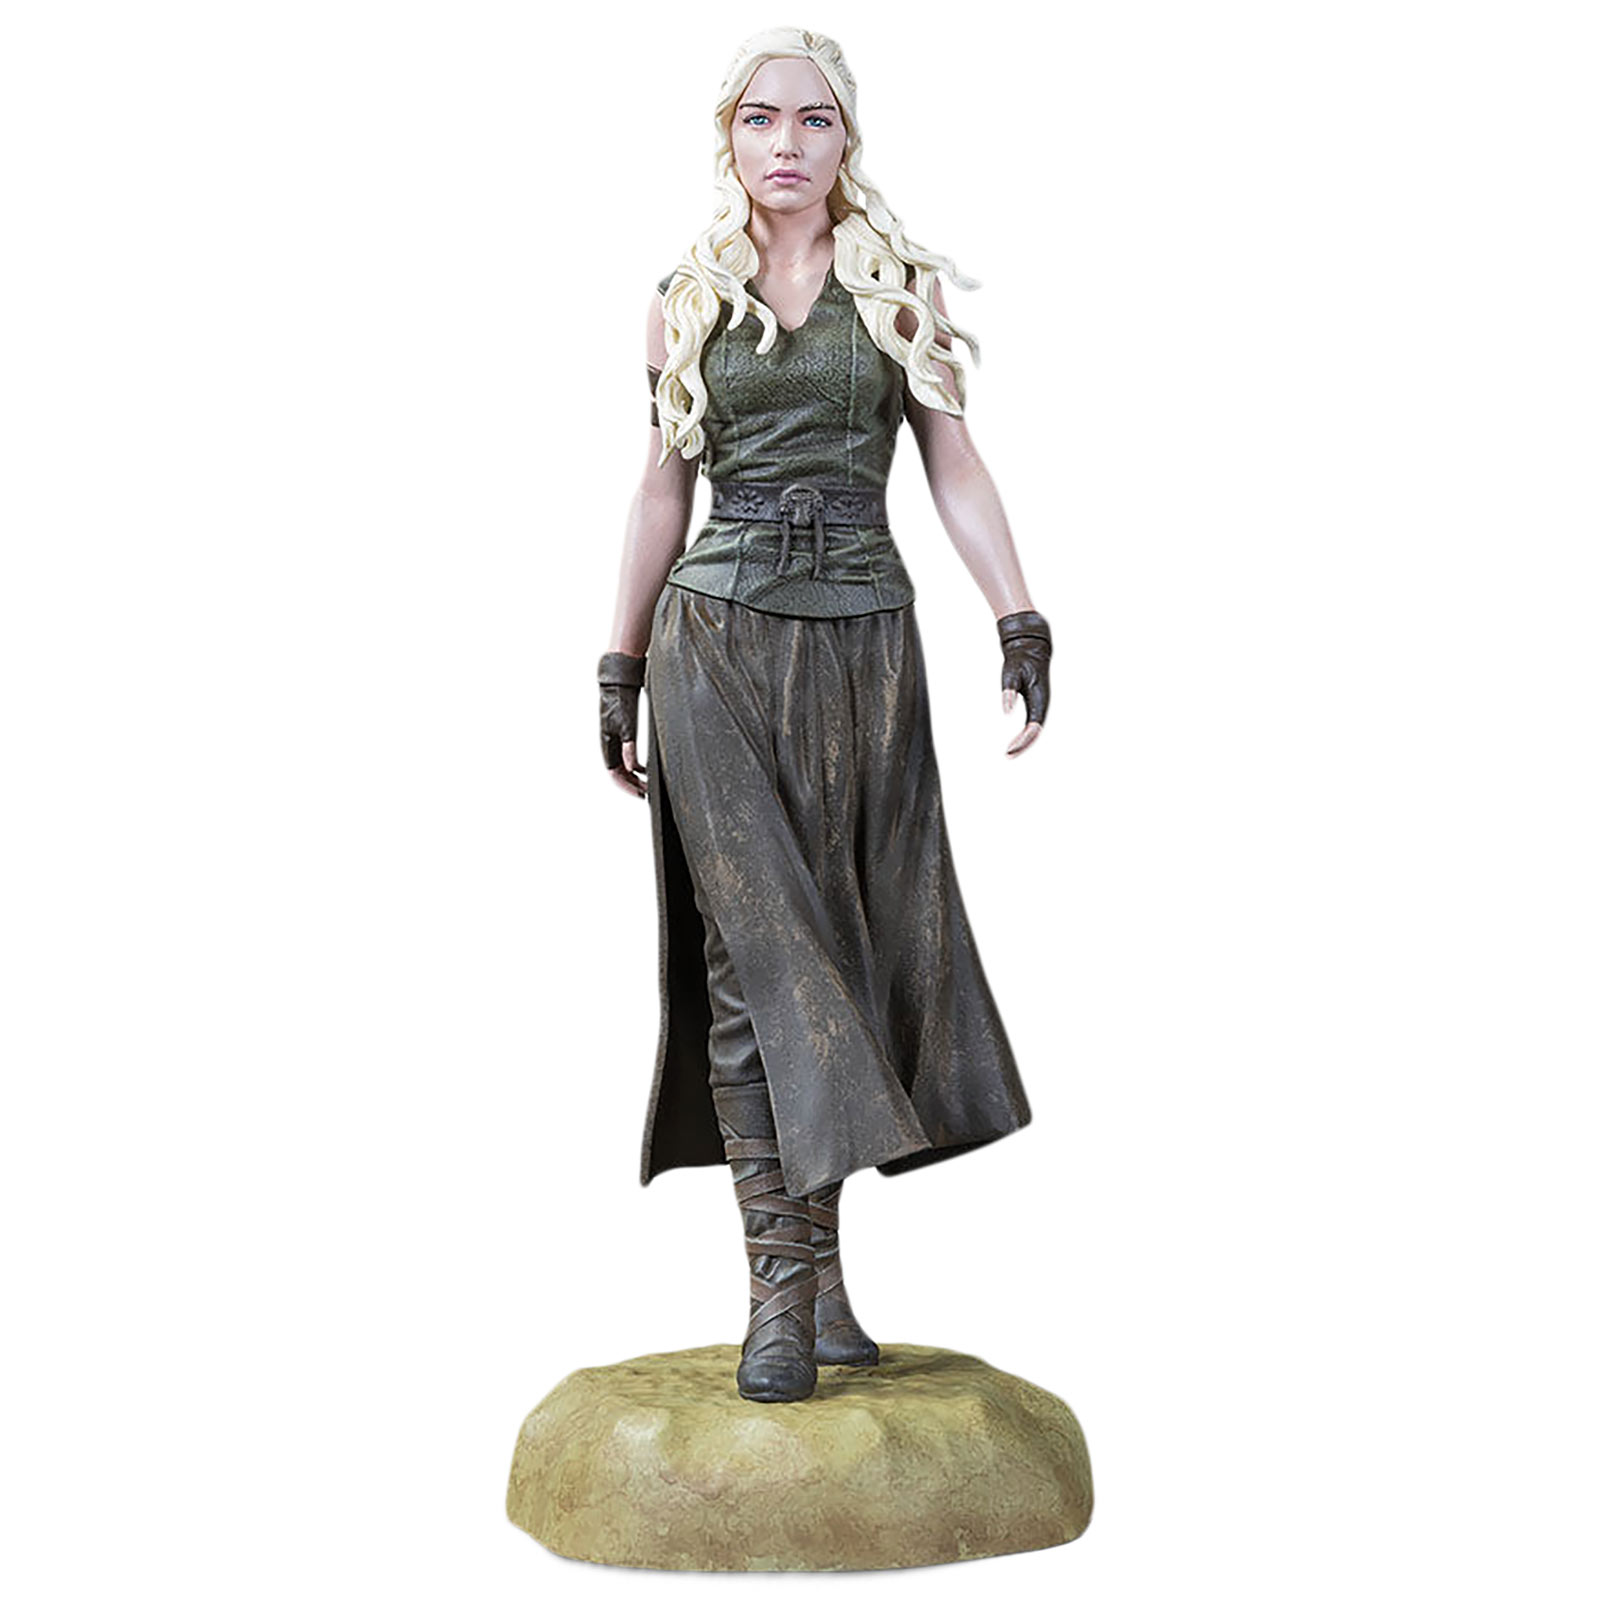 Game of Thrones - Daenerys Targaryen Figur 19cm